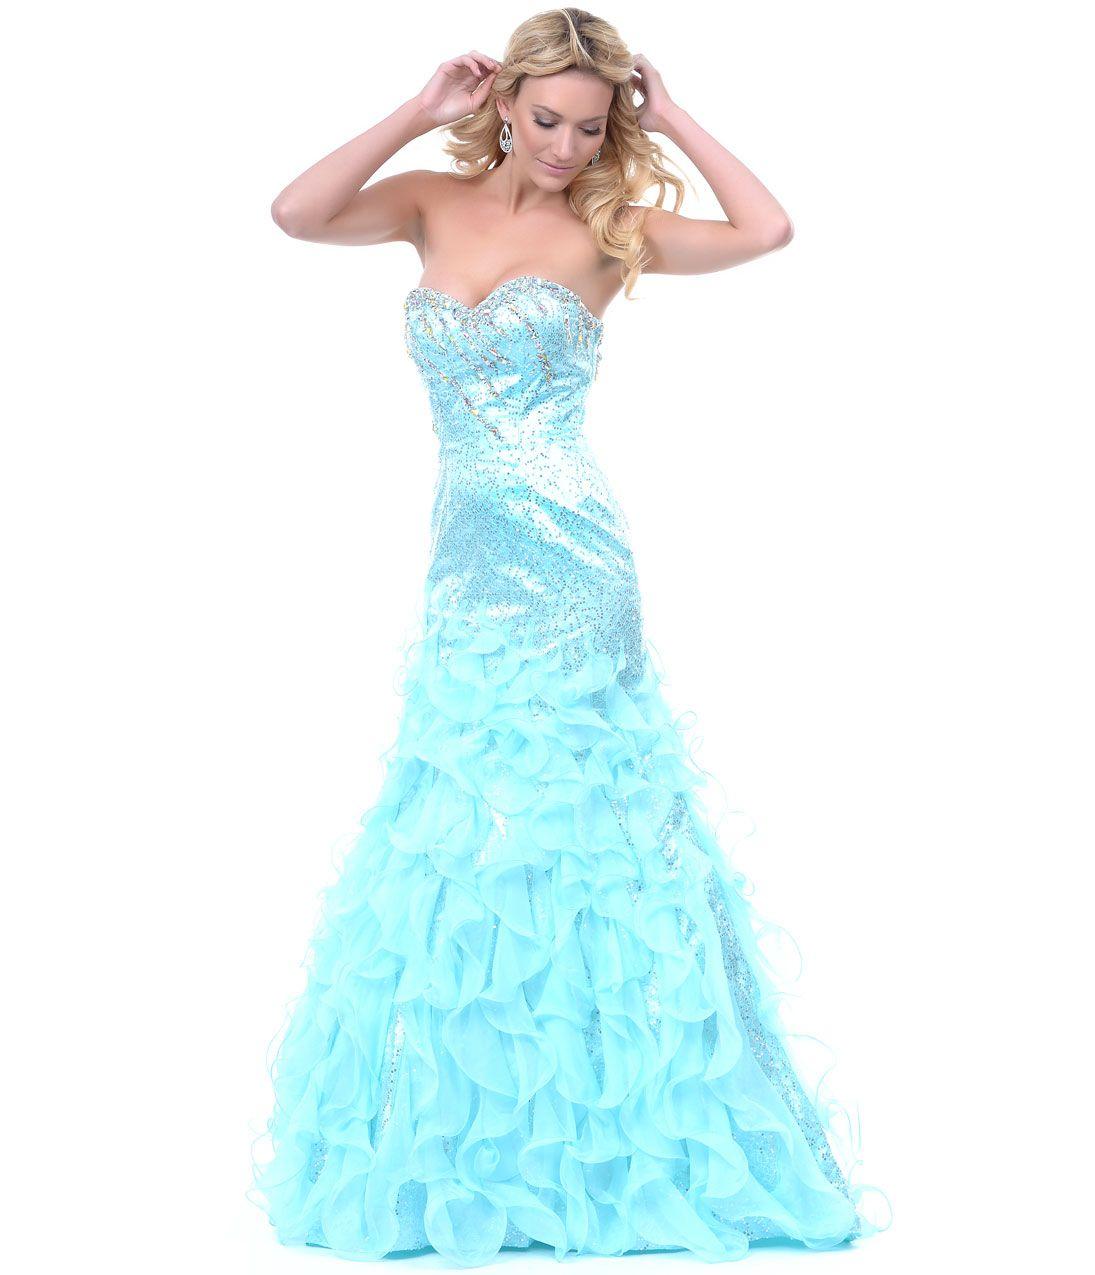 Light blue prom dress dresses dresses prom dresses prom